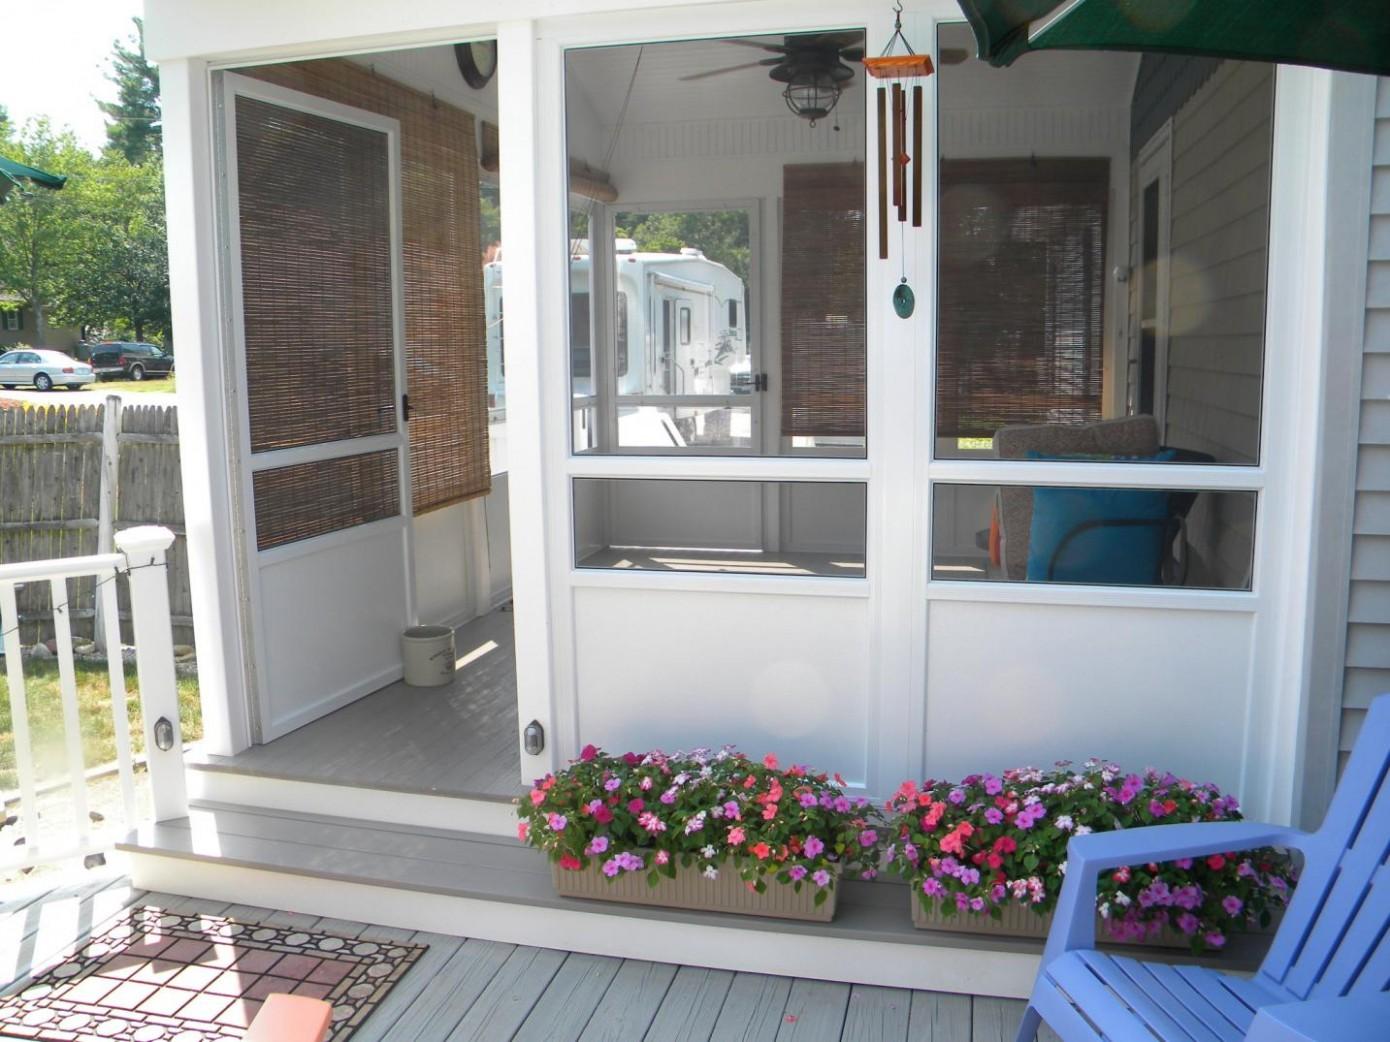 Decor Screened In Porch Ideas With Frame Design As Patio Enclosure  - Apartment Balcony Enclosure Ideas